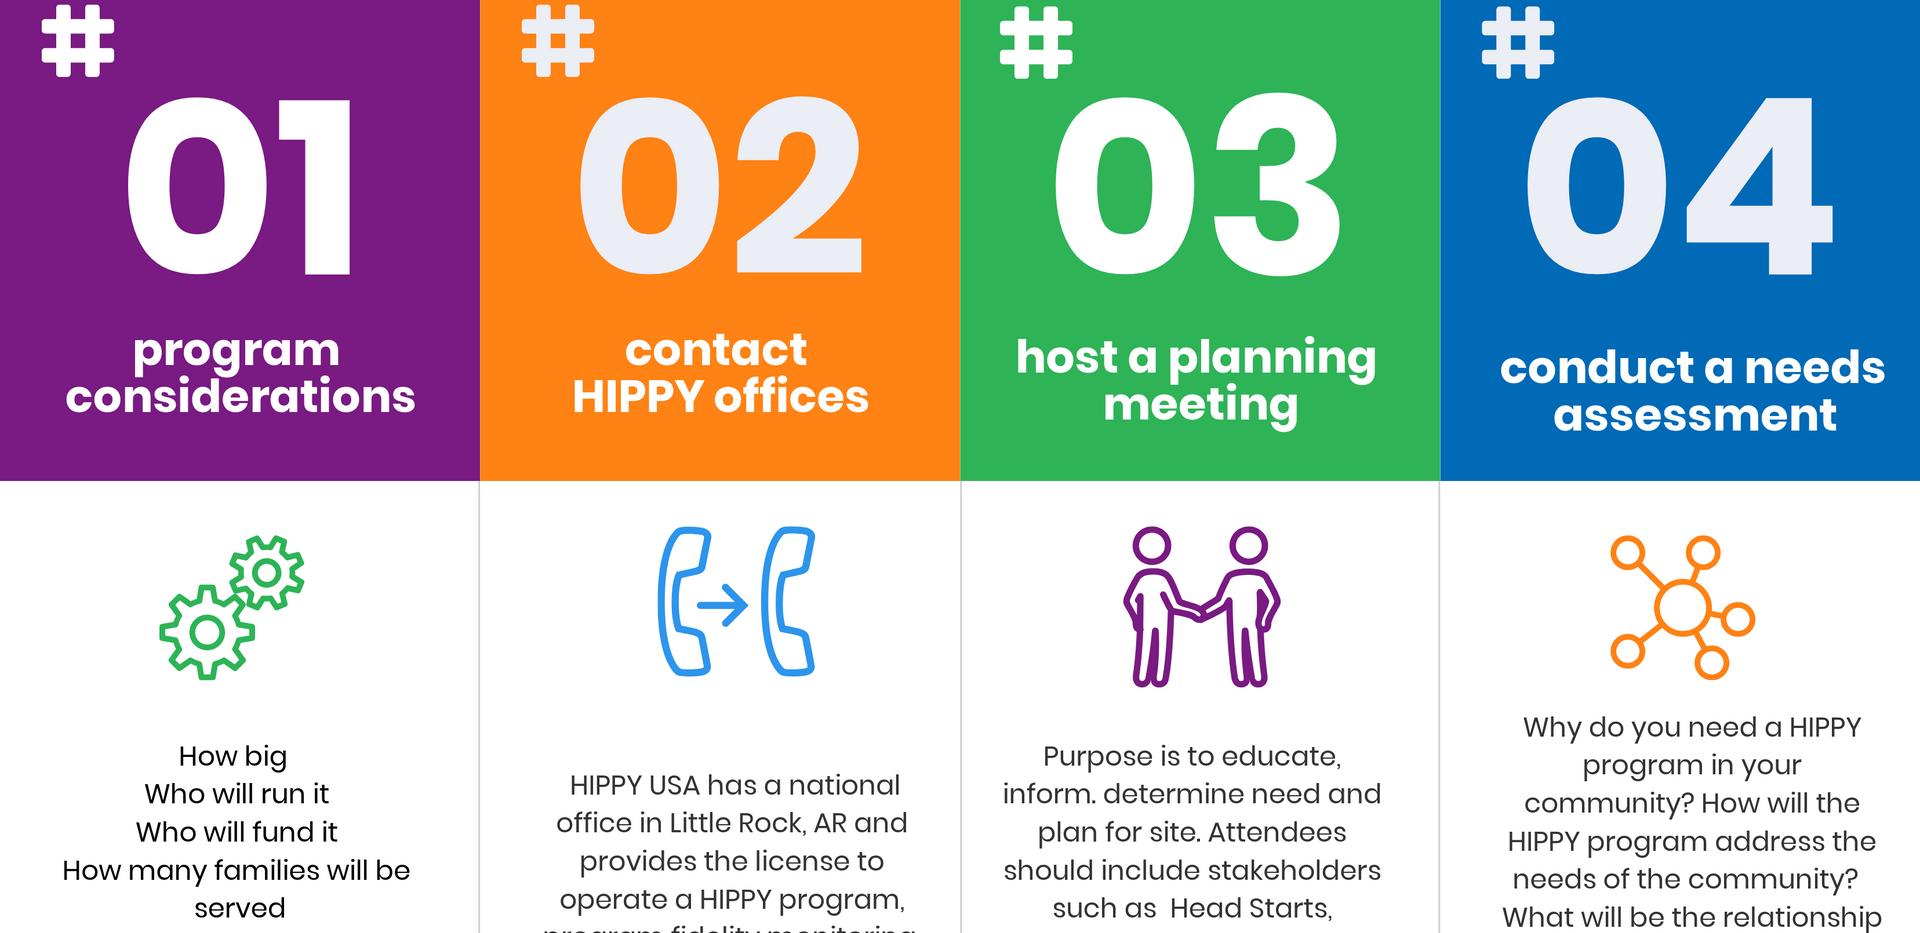 How Start a HIPPY Program